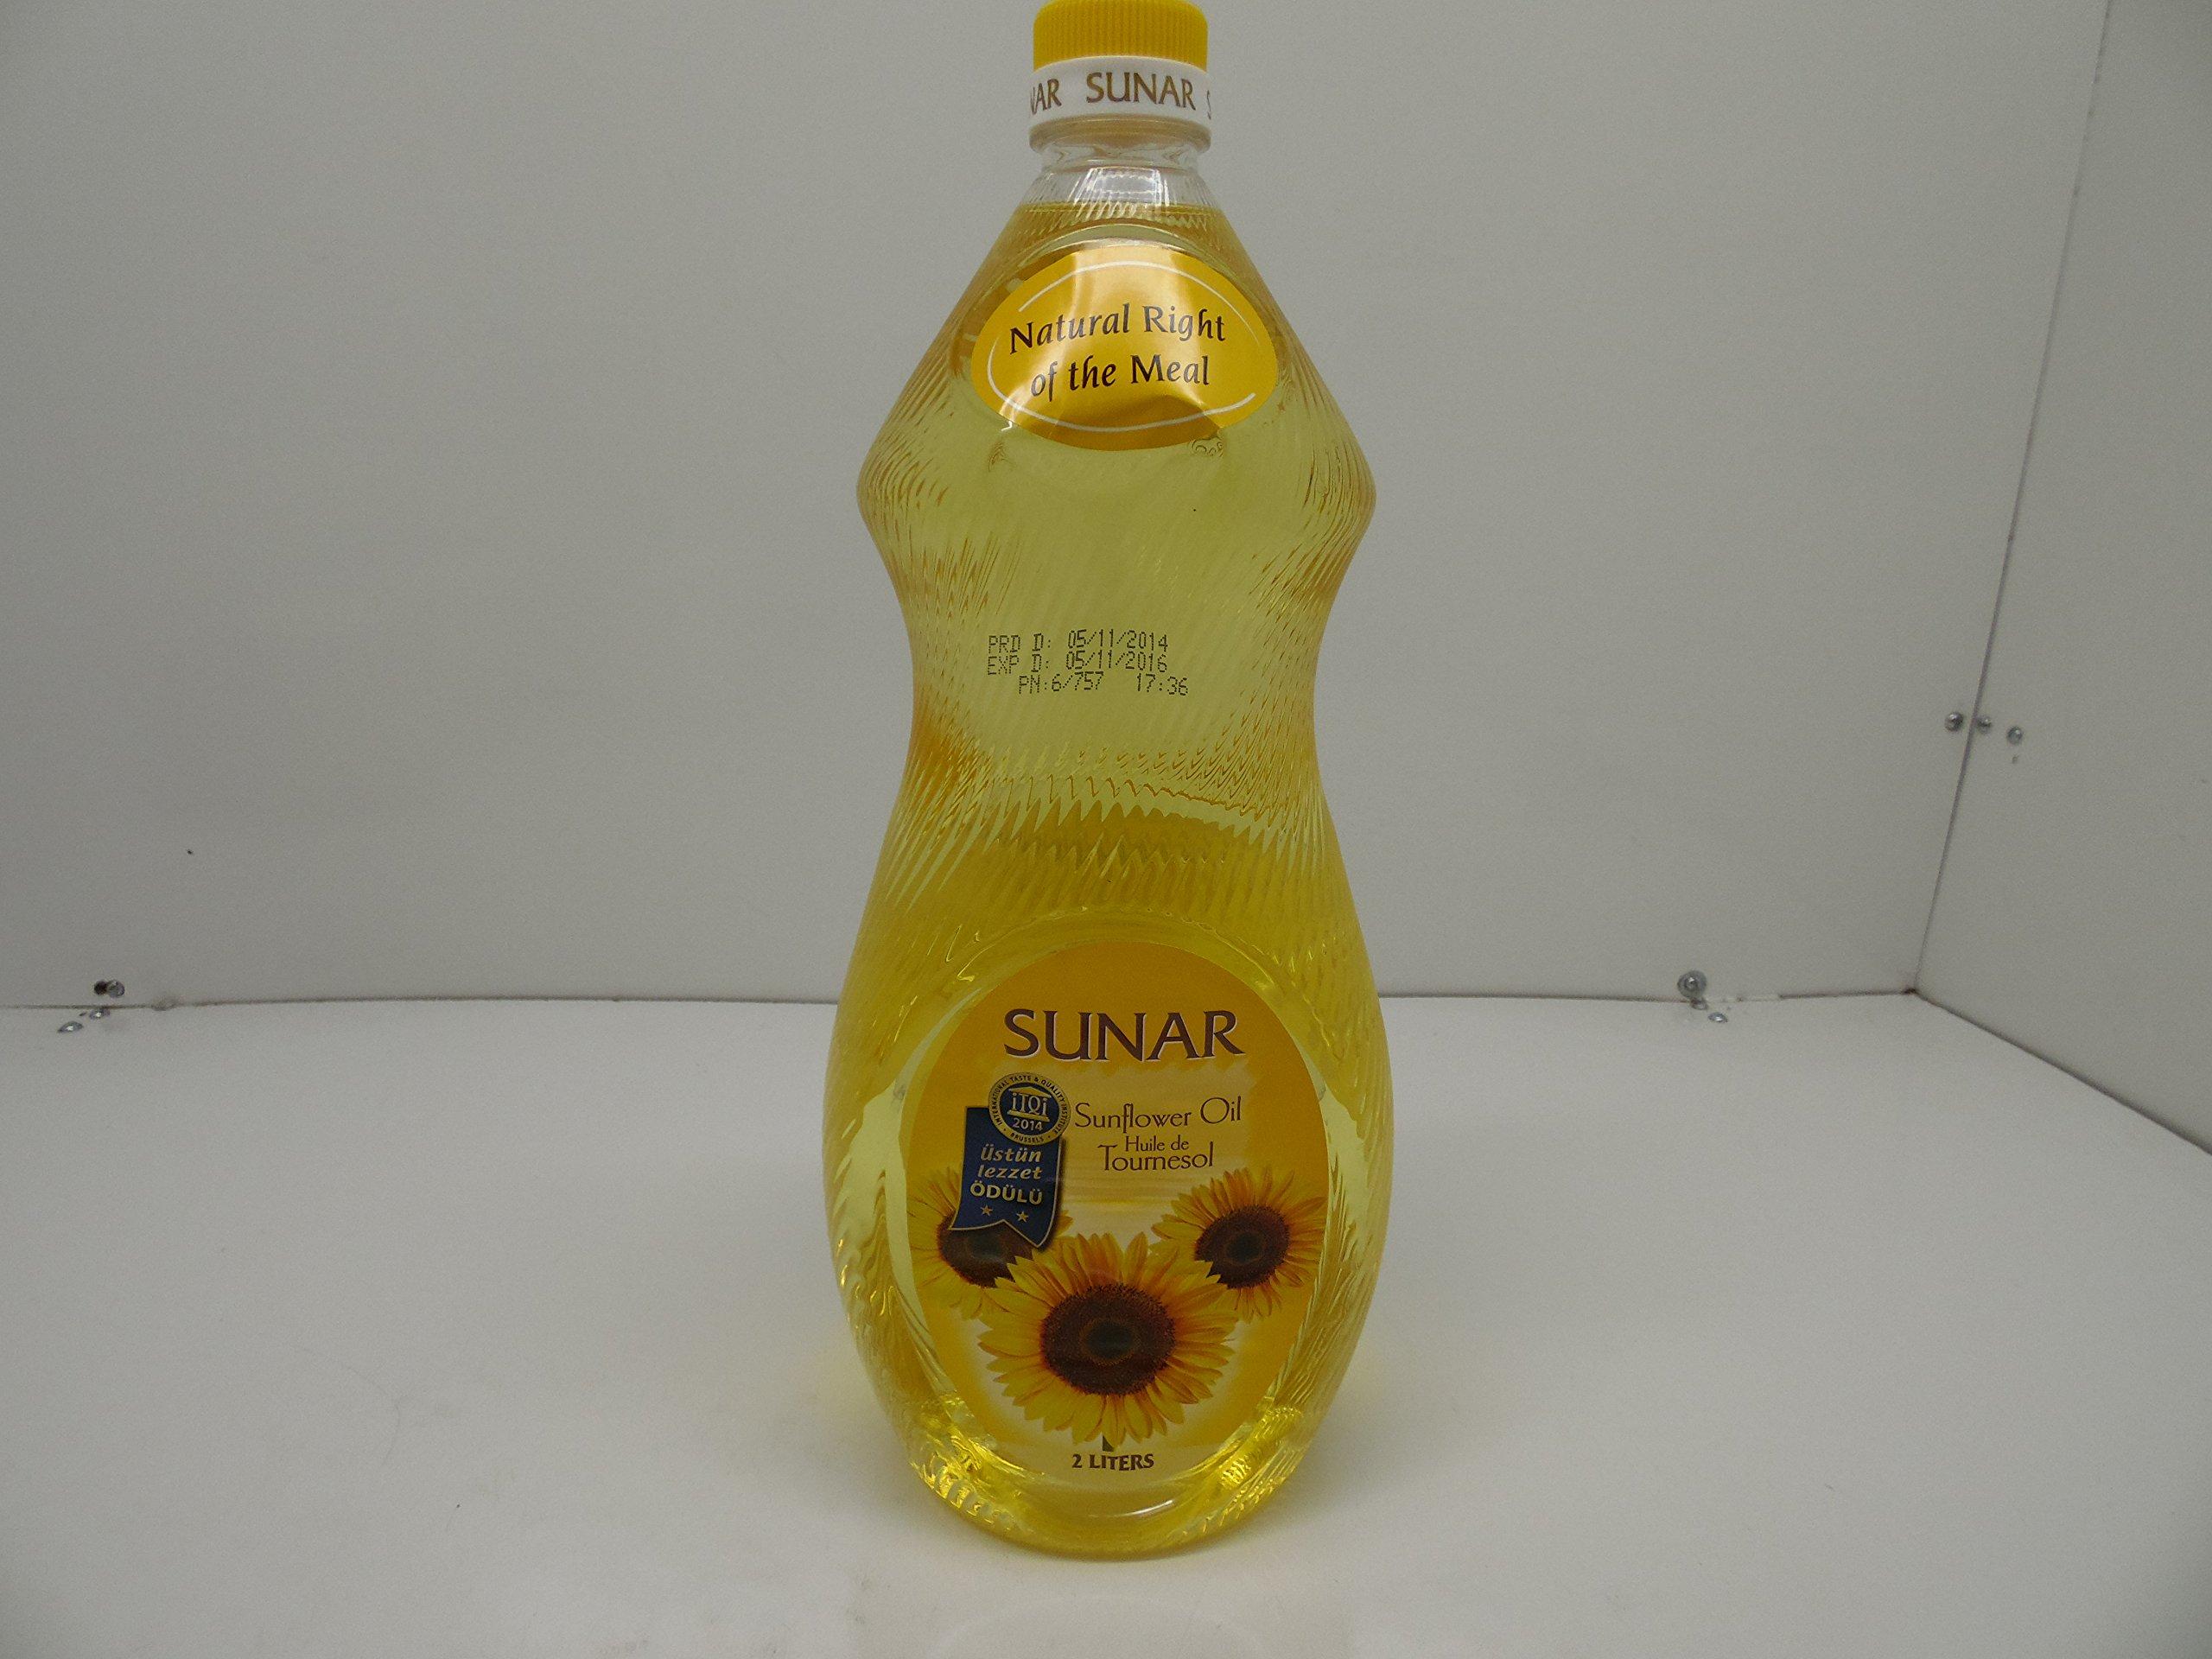 Sunar Turkish Sunflower Oil 68 oz (2lt)